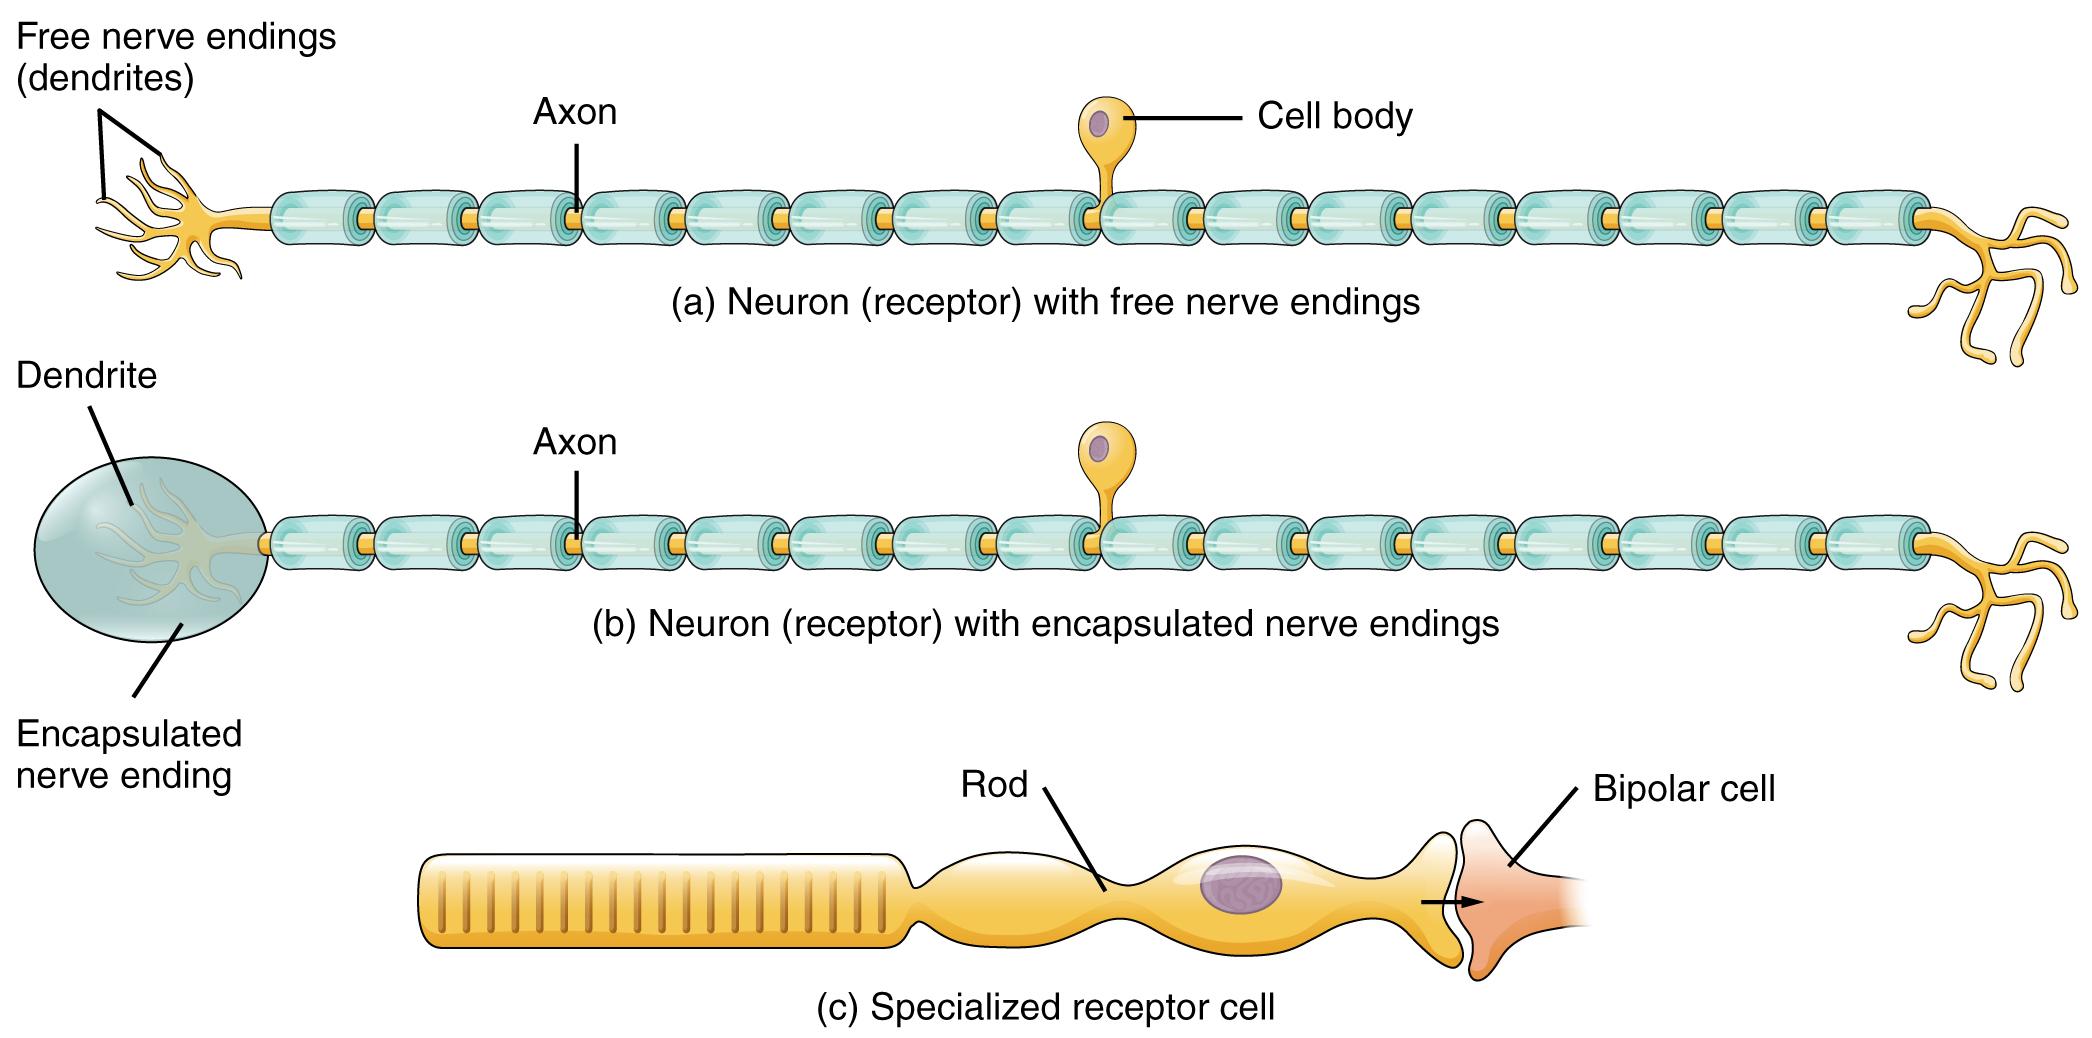 Modern Neuron Anatomy And Physiology Exercise 13 Photo - Physiology ...